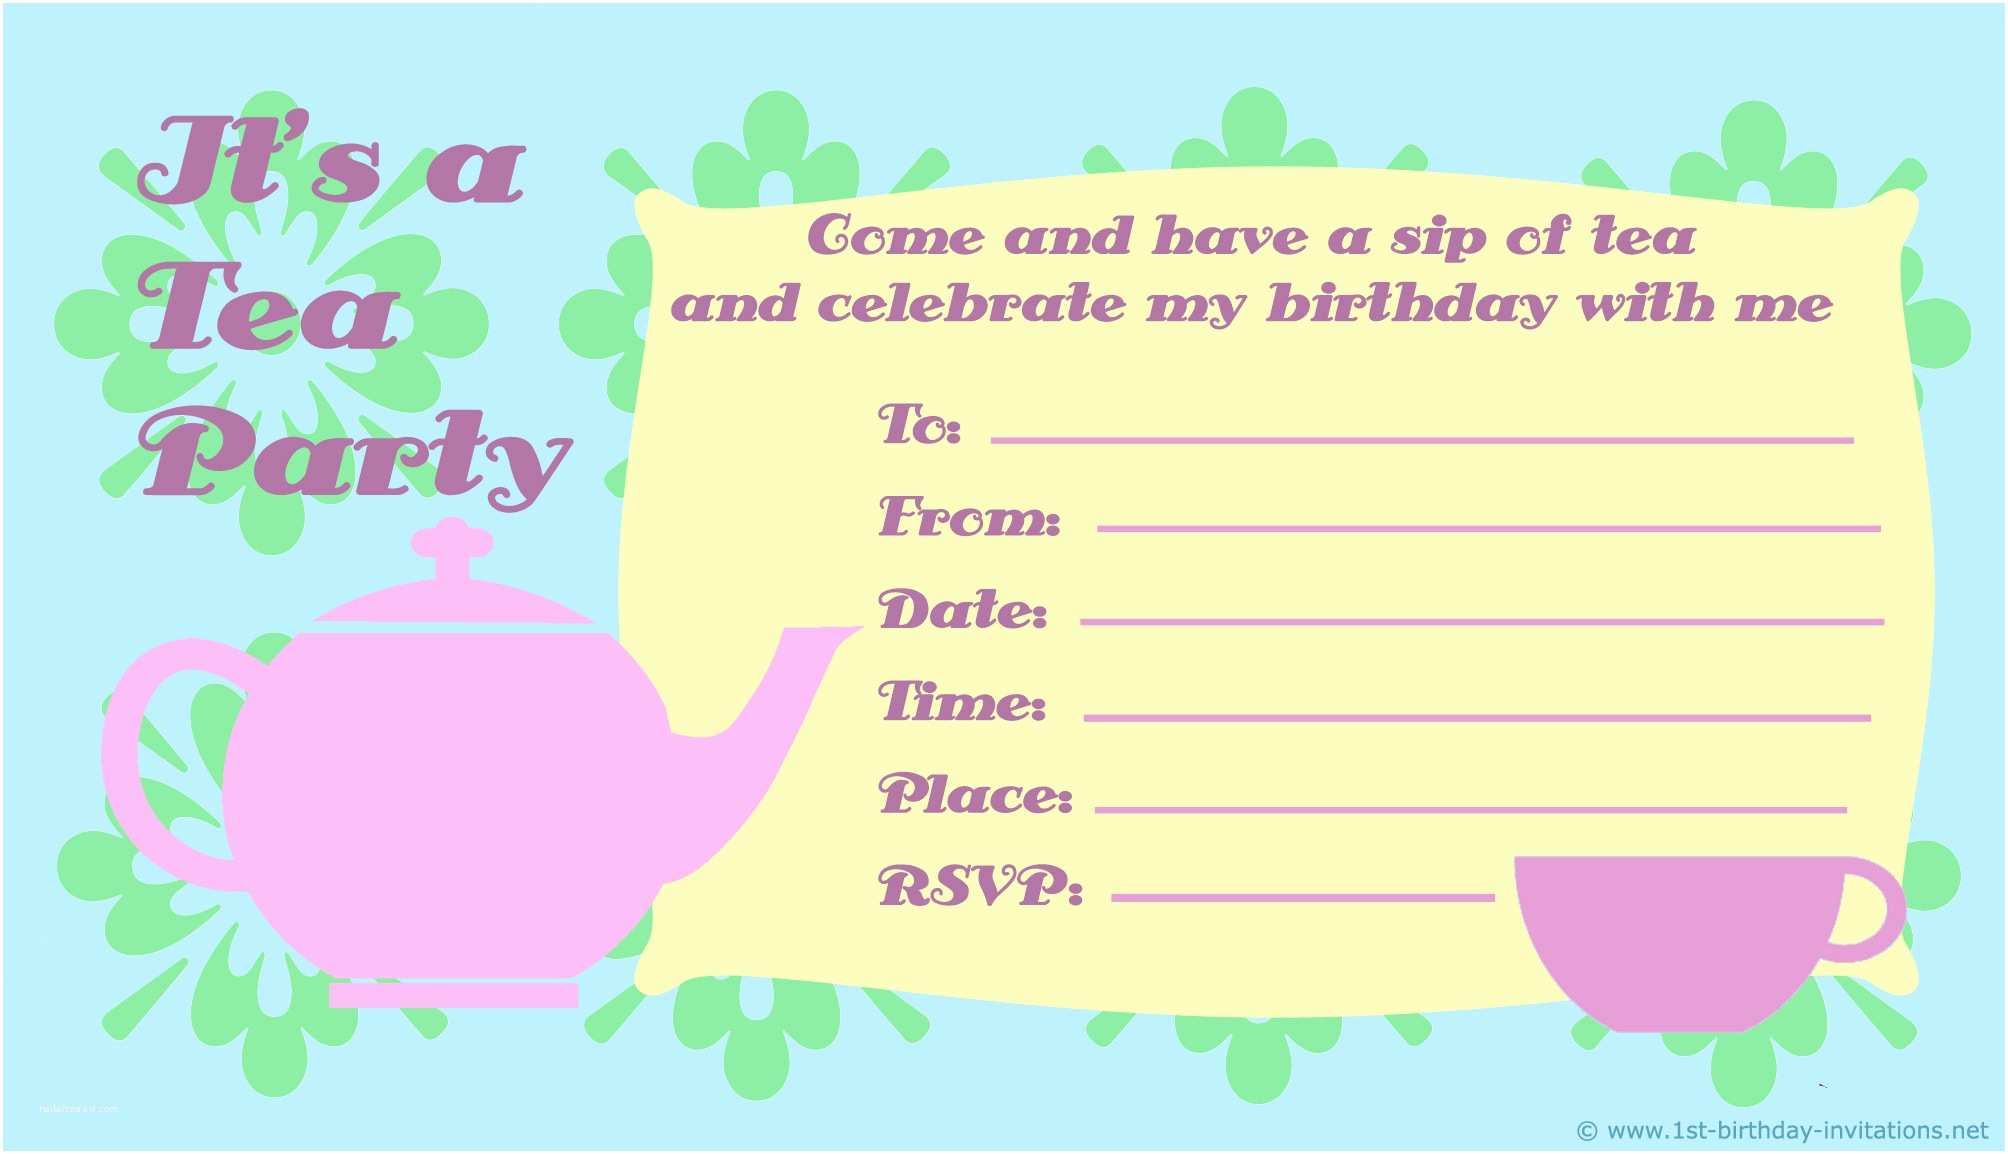 Printable Birthday Party Invitations Kids Birthday Party Invitations Free & Printable